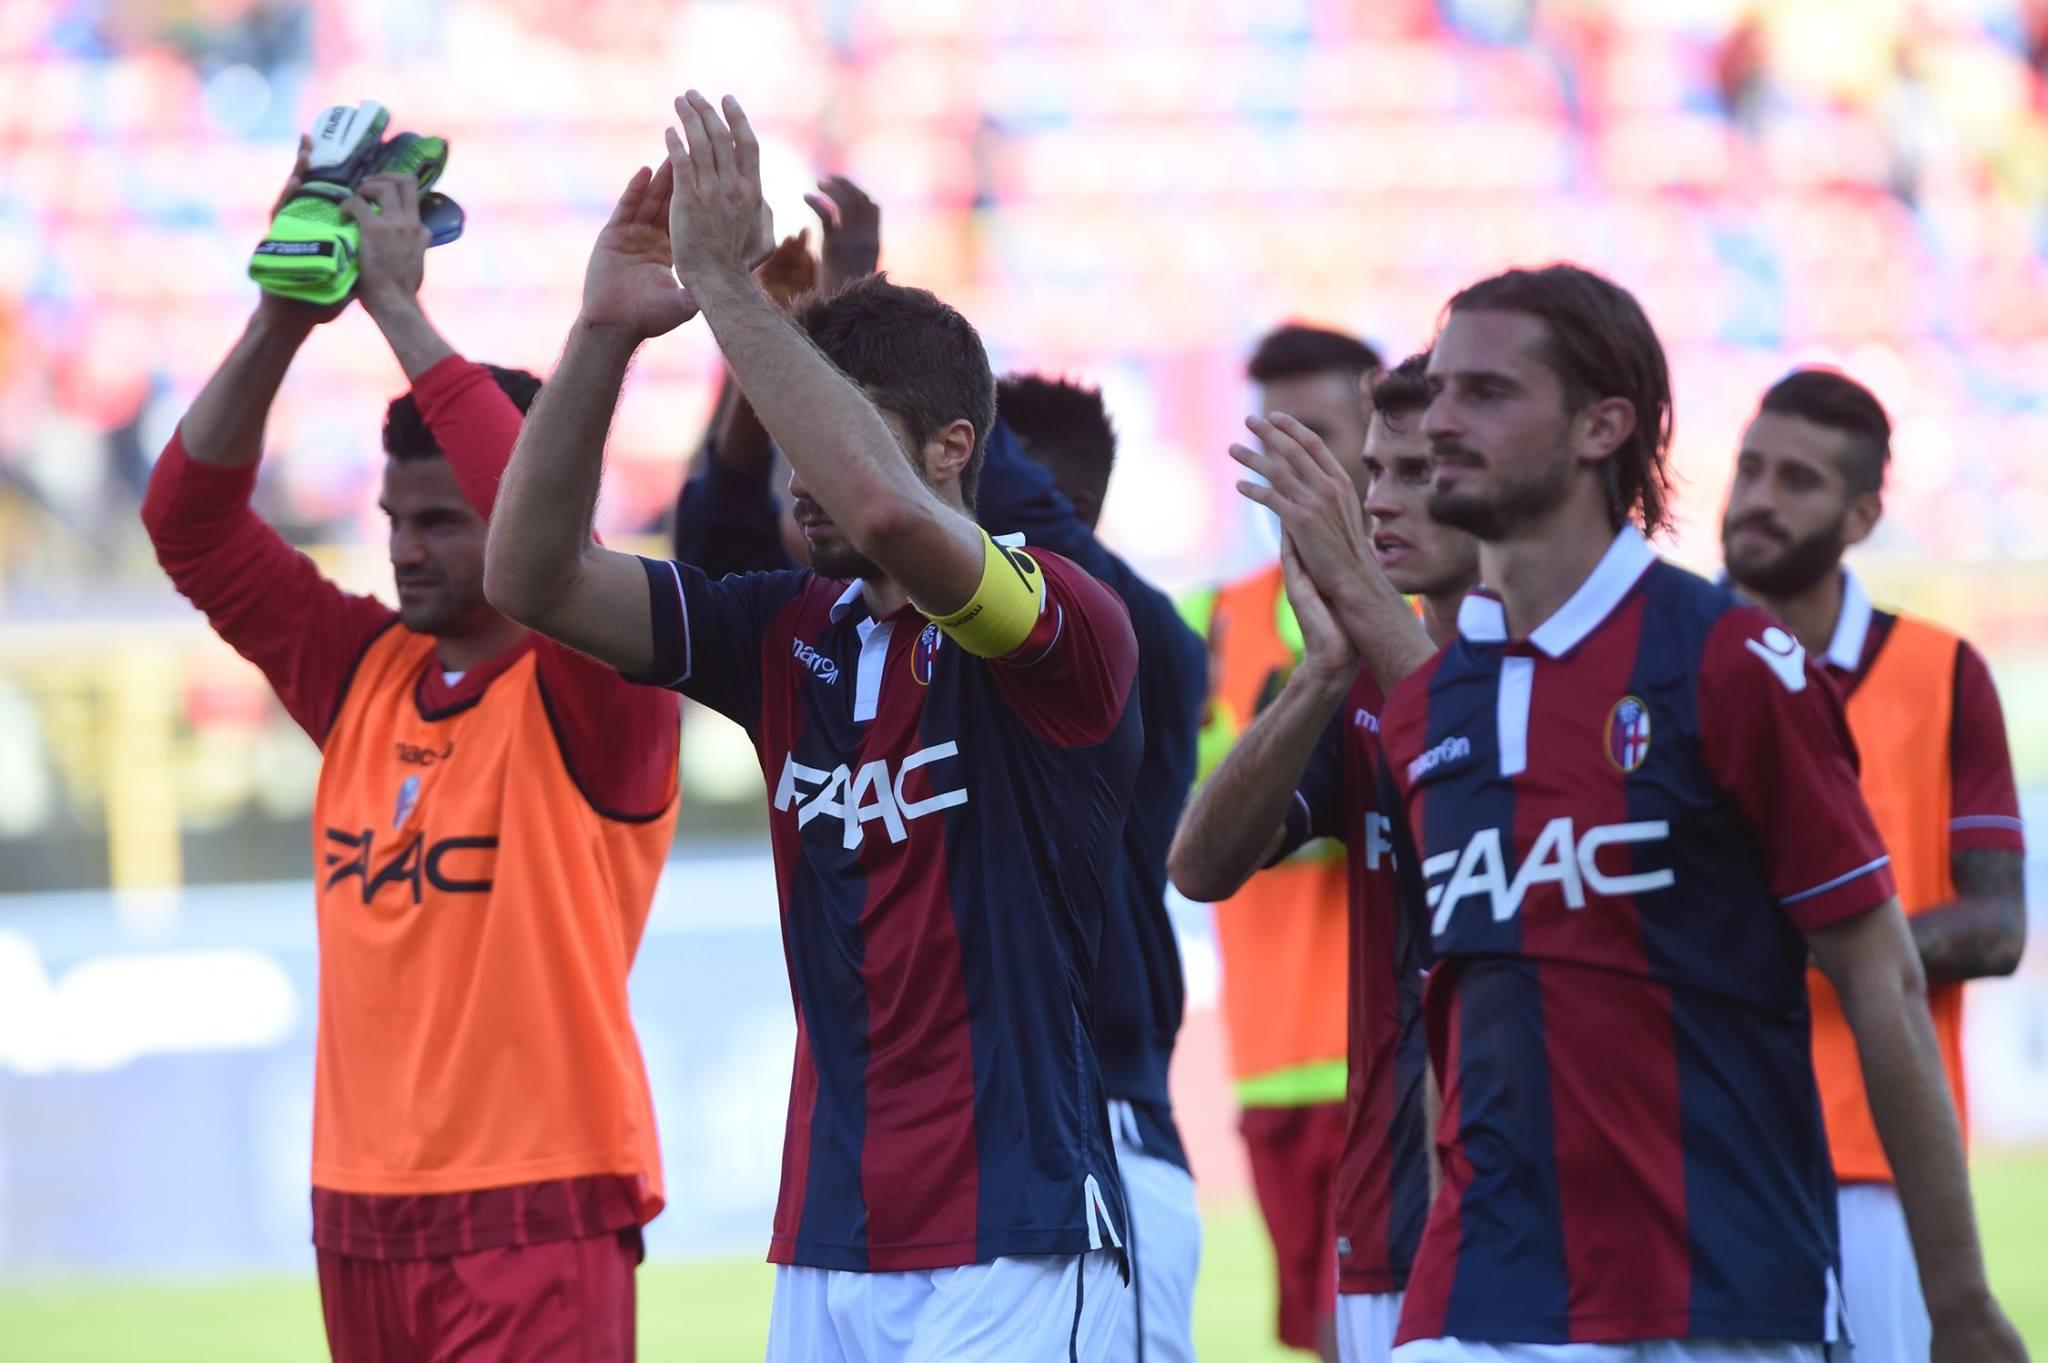 Grandiiii!!! © Bologna FC